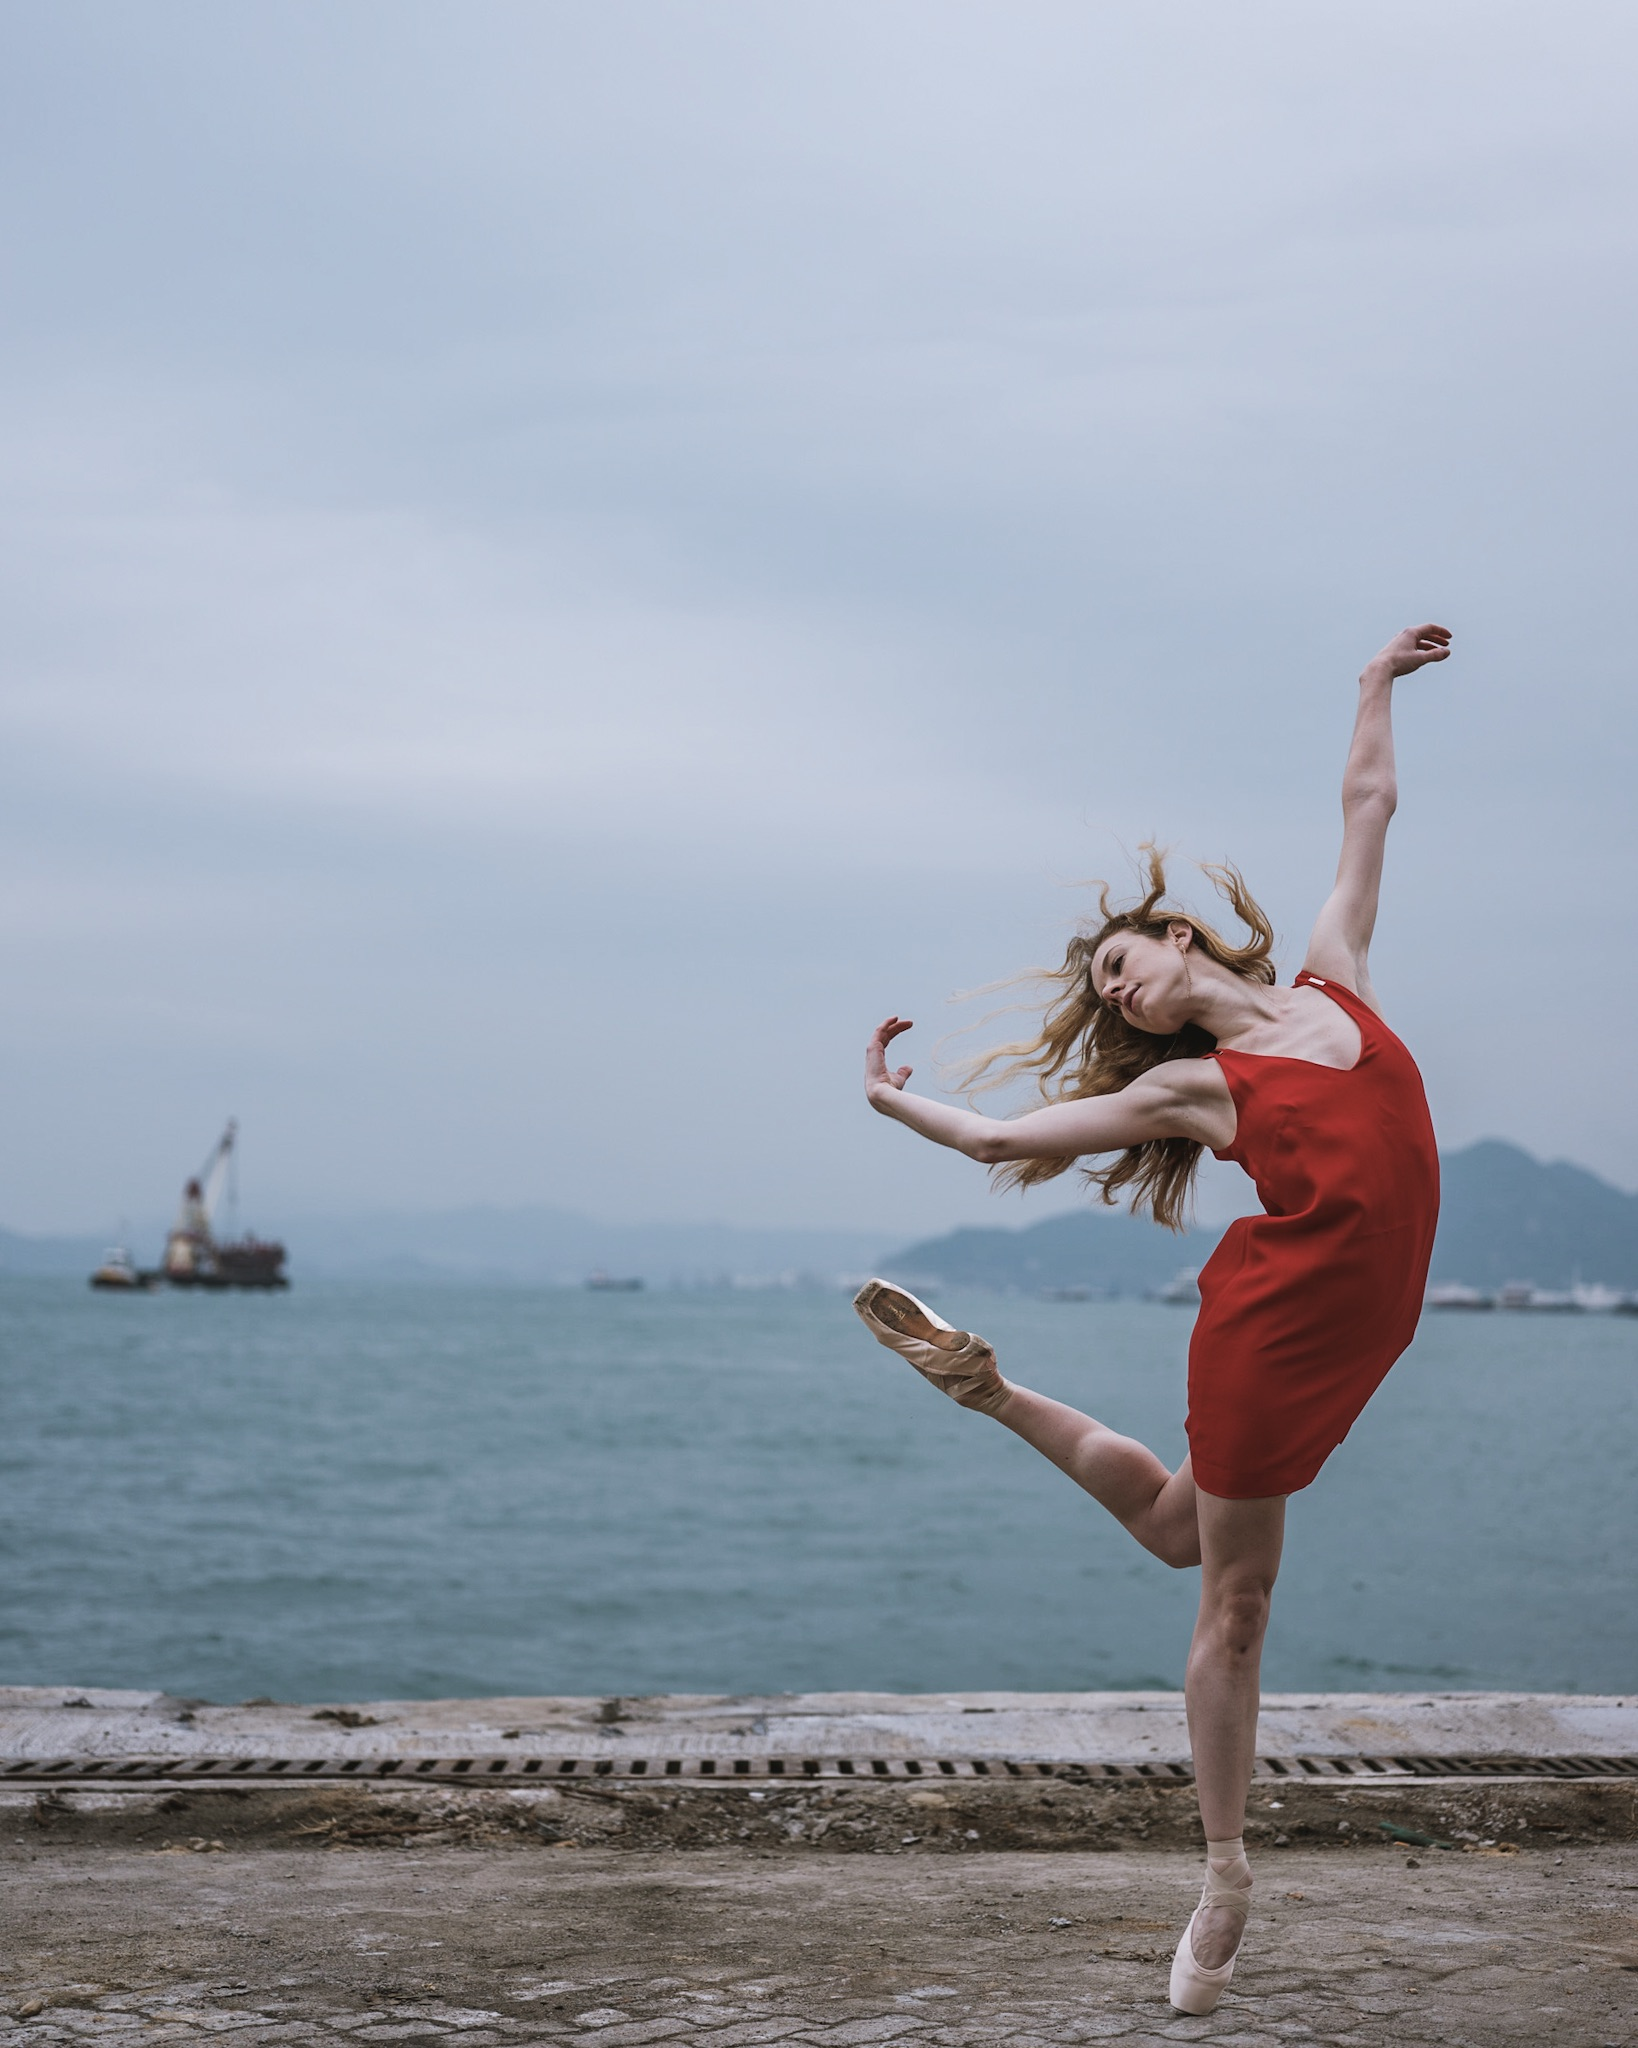 ballet dancer on the beach